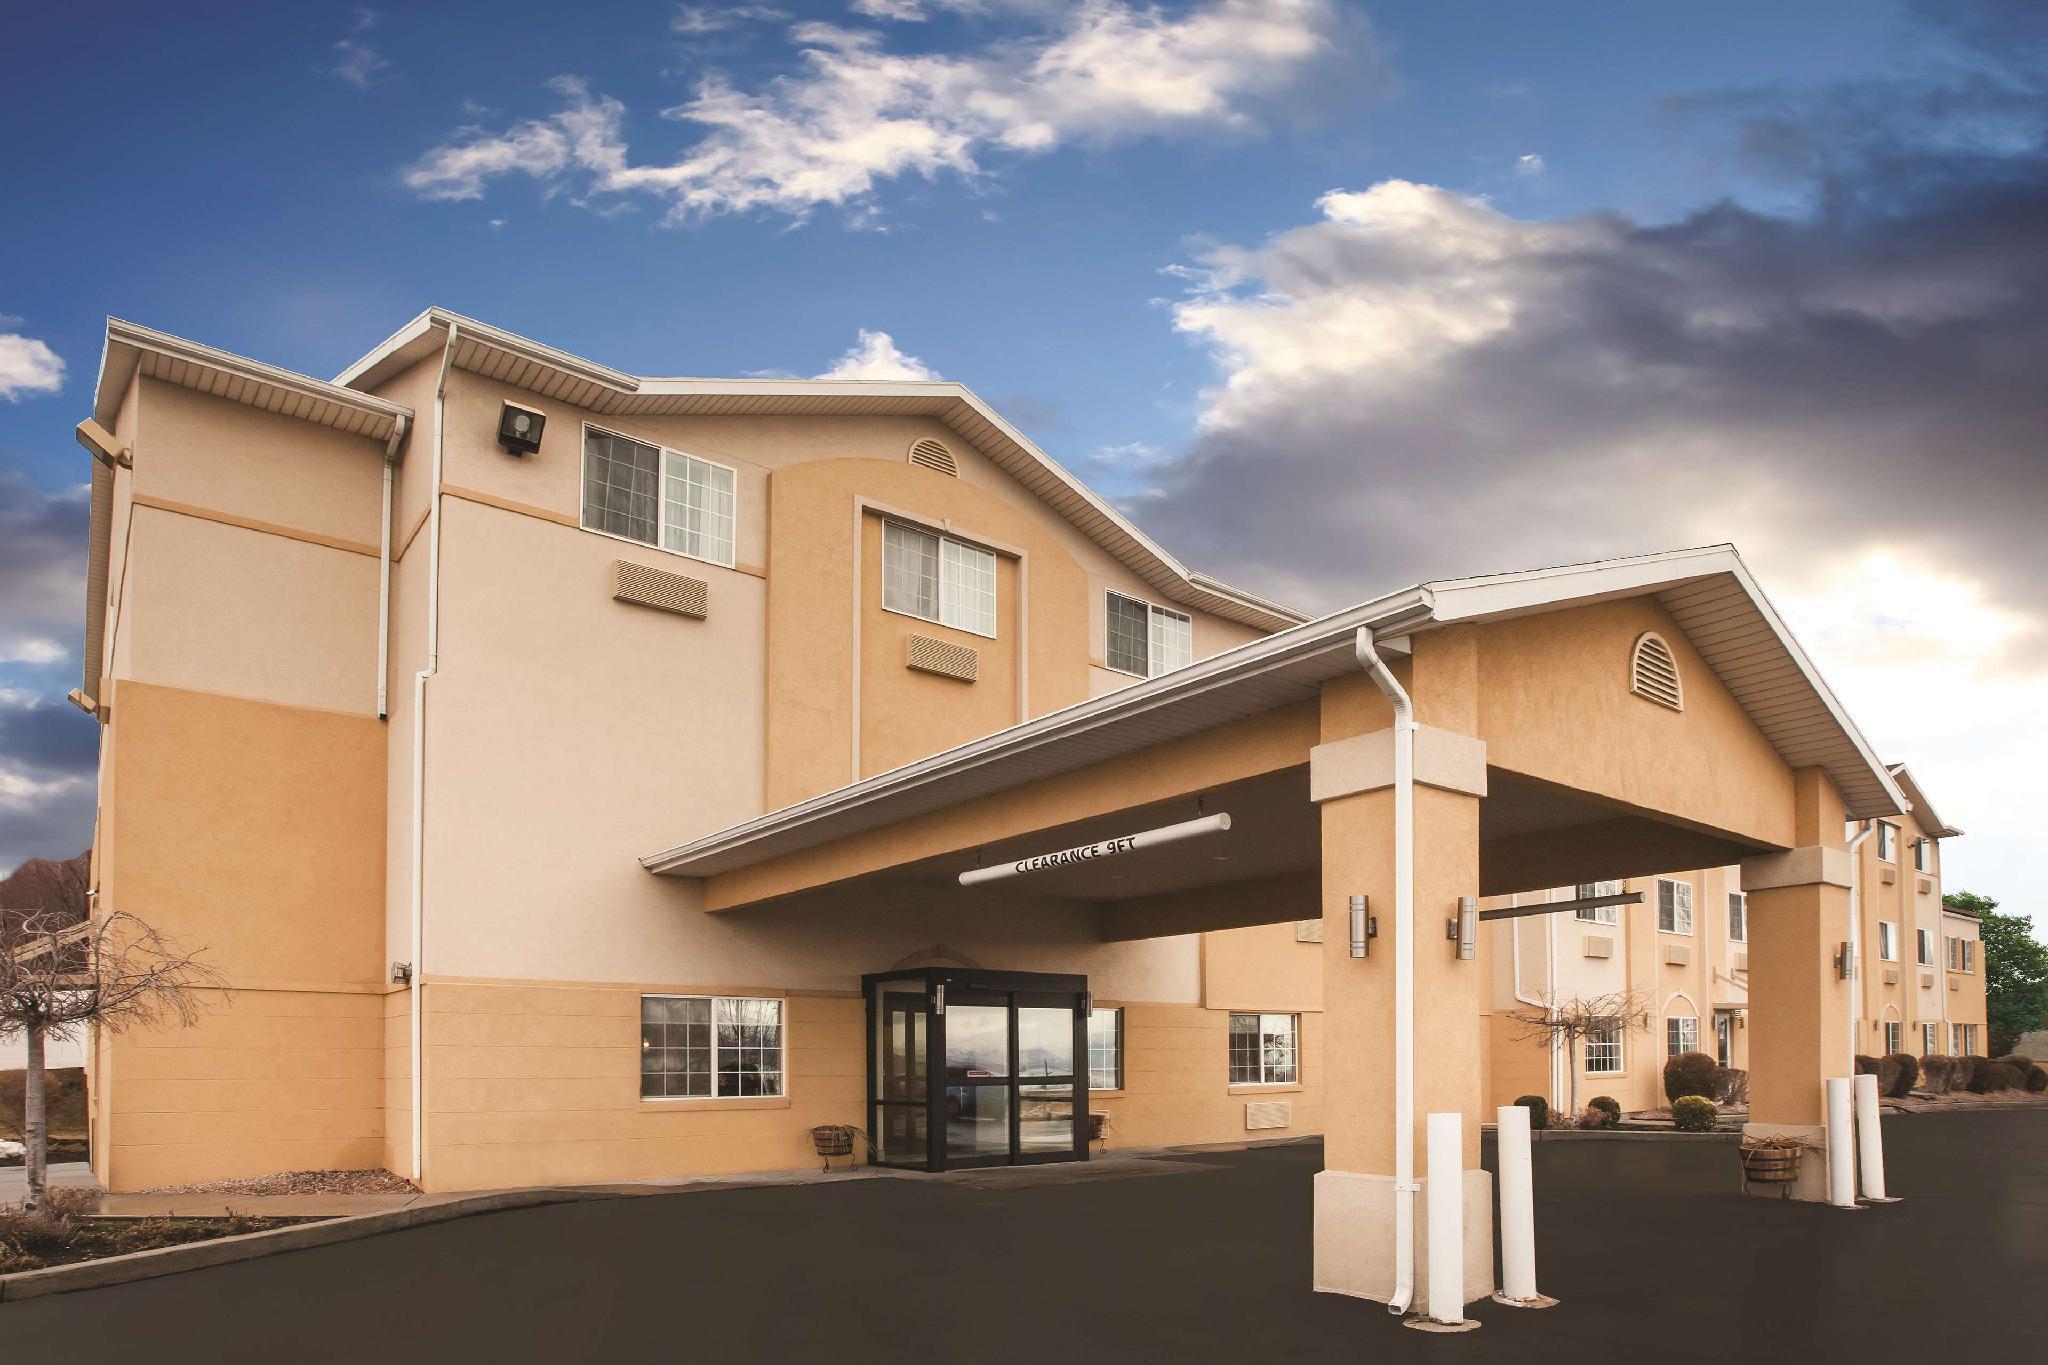 La Quinta Inn And Suites By Wyndham North Orem